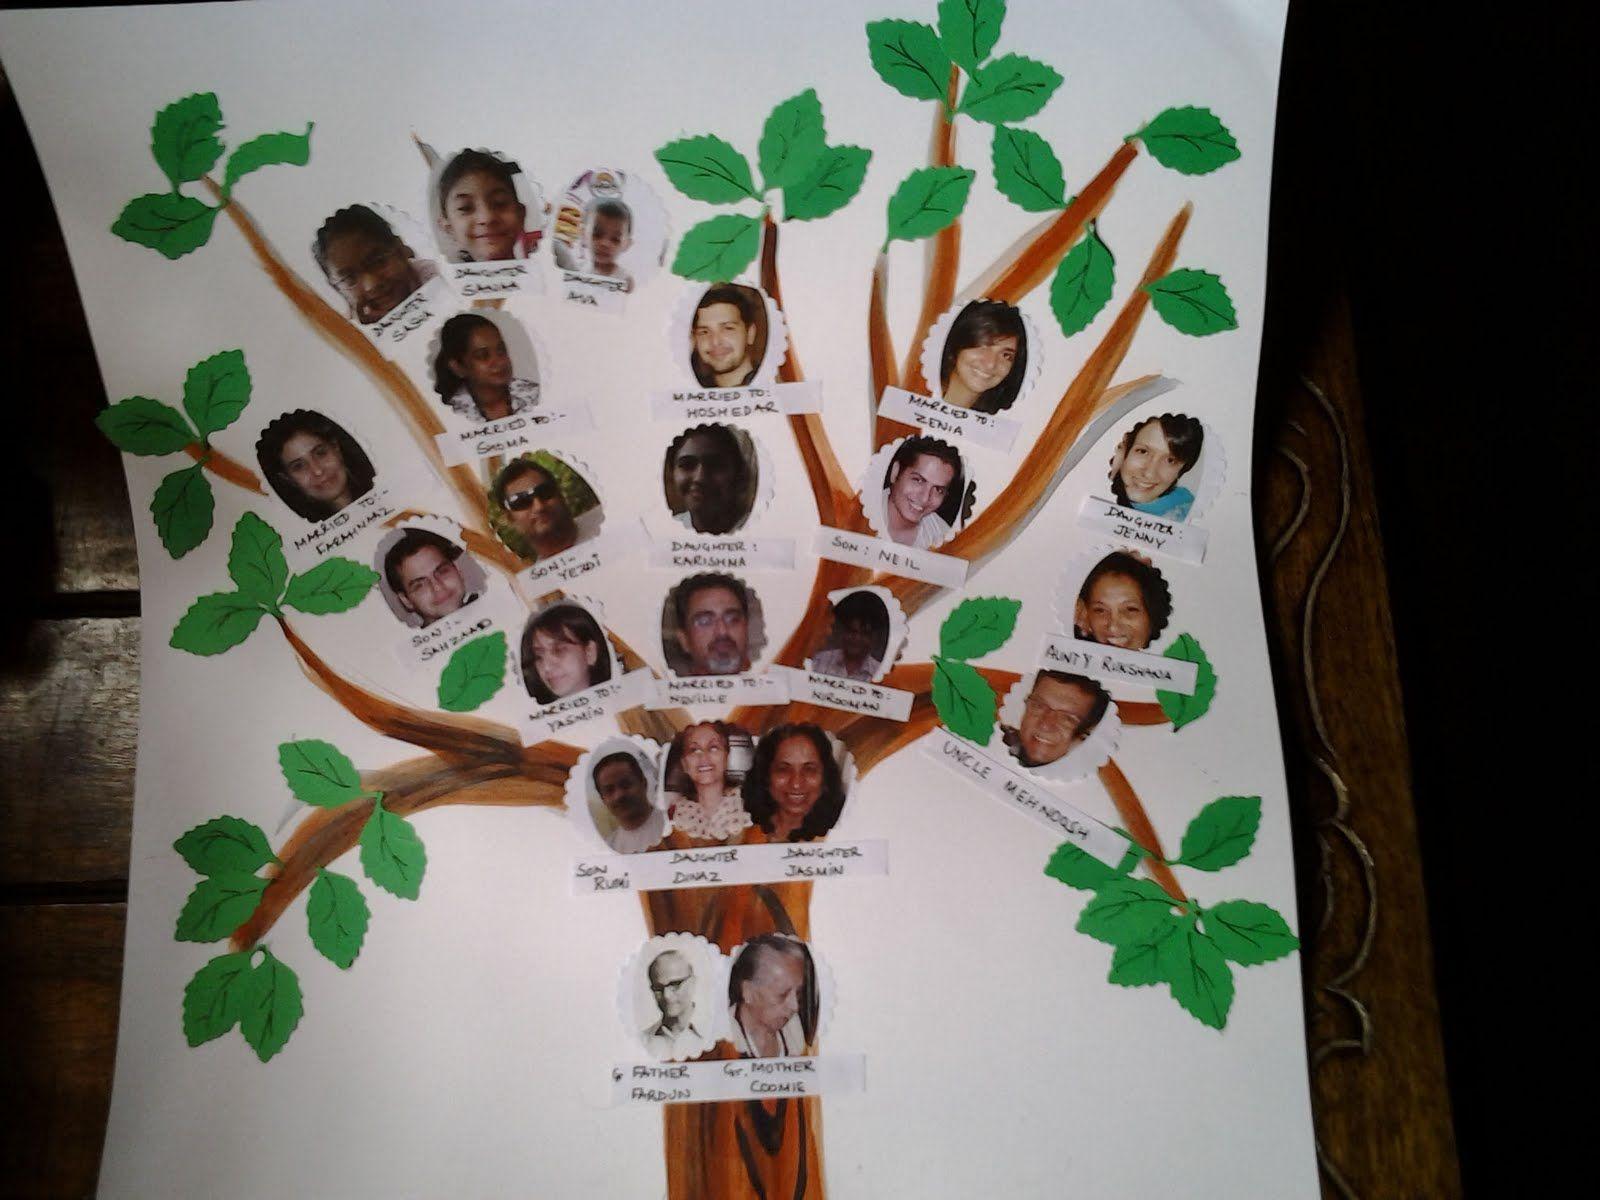 Family Tree School Project Ideas | Crafty stuff ...